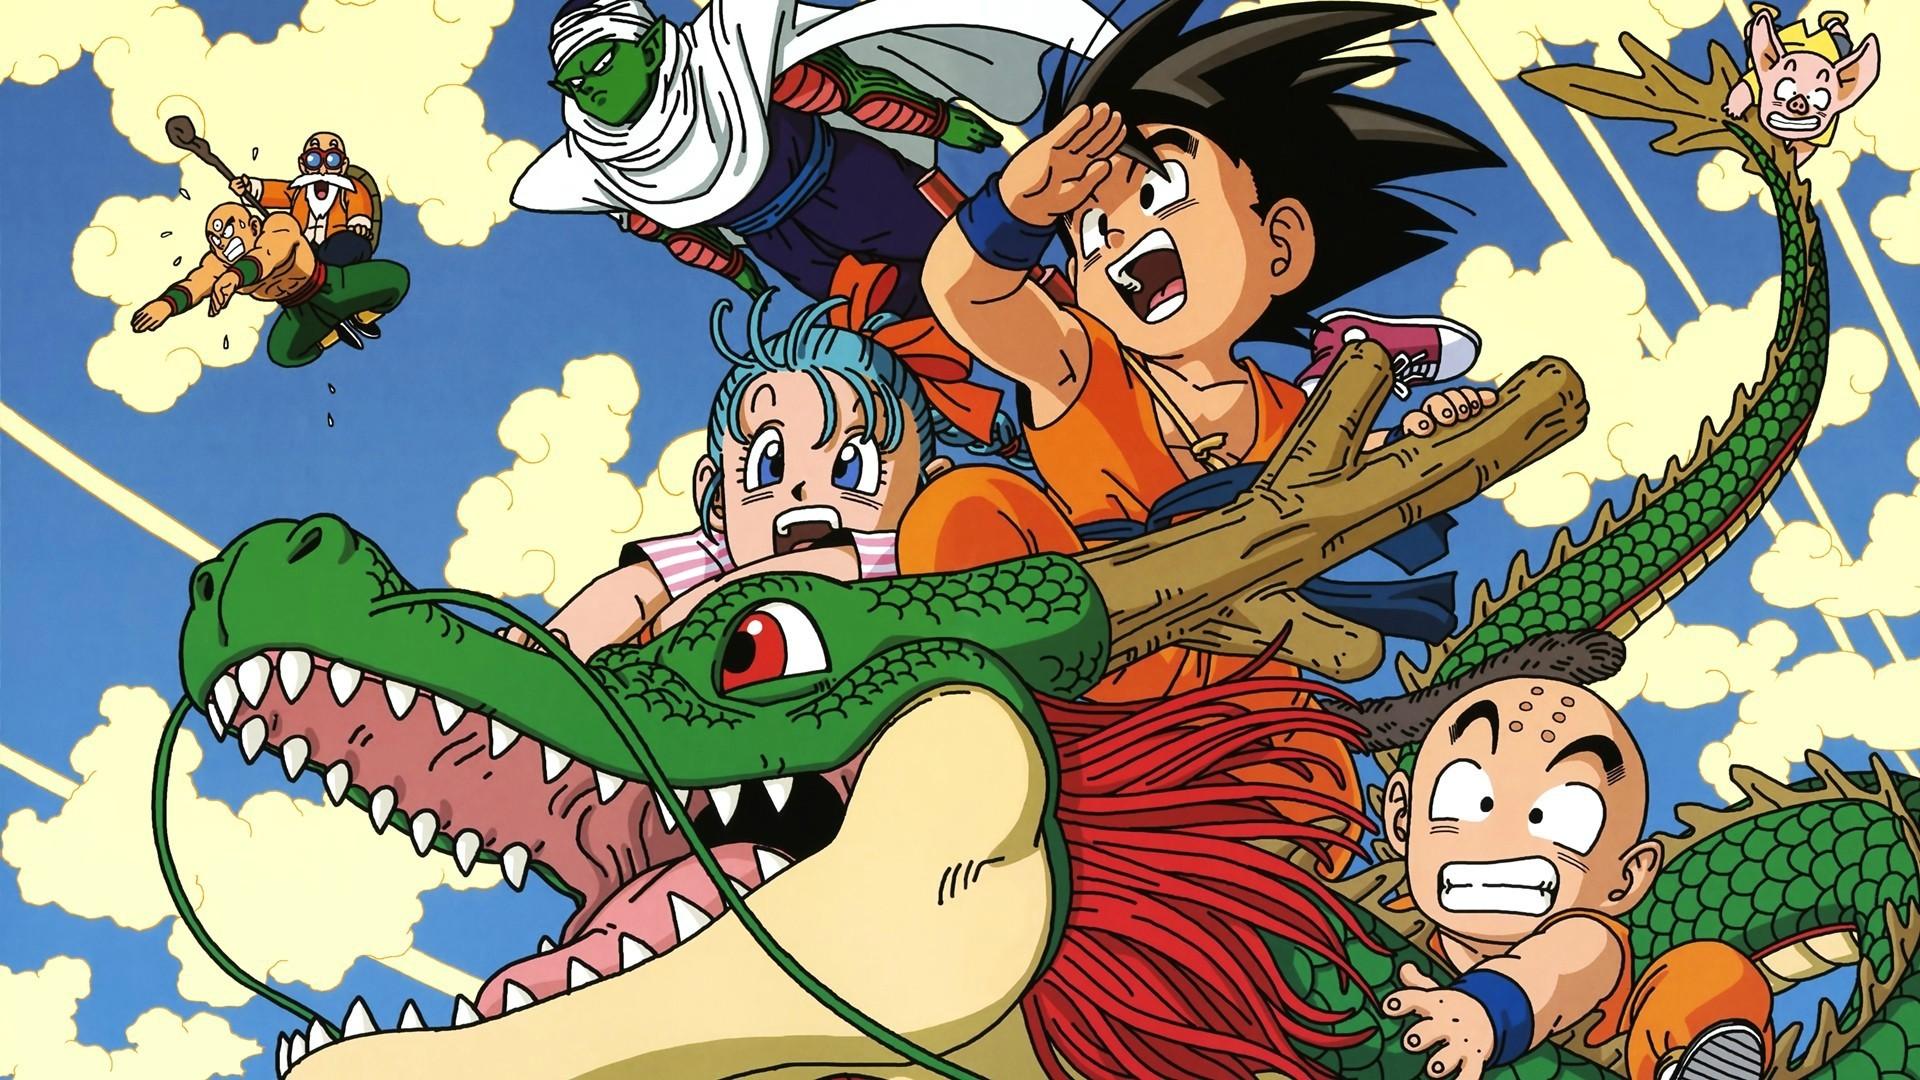 Illustration Anime Karikatur Dragon Ball Z Comics Mythologie Bulma Piccolo Muten Roshi Kid Goku Krillin Erfundener